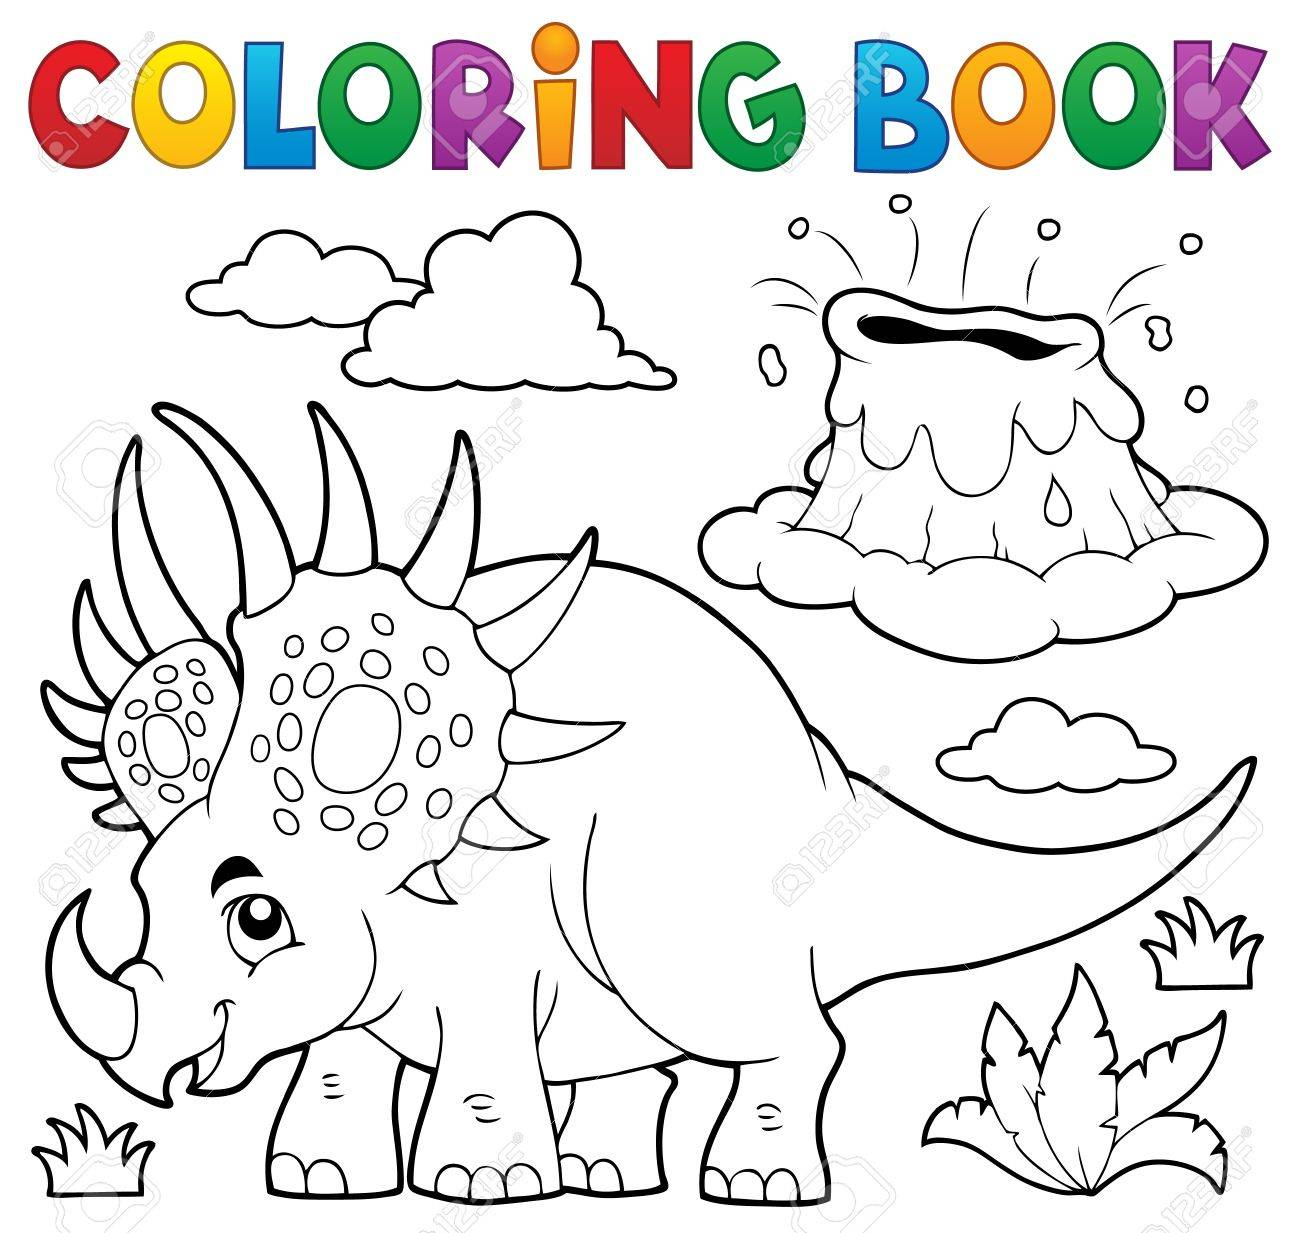 Coloring Book Dinosaur Topic Stock Vector